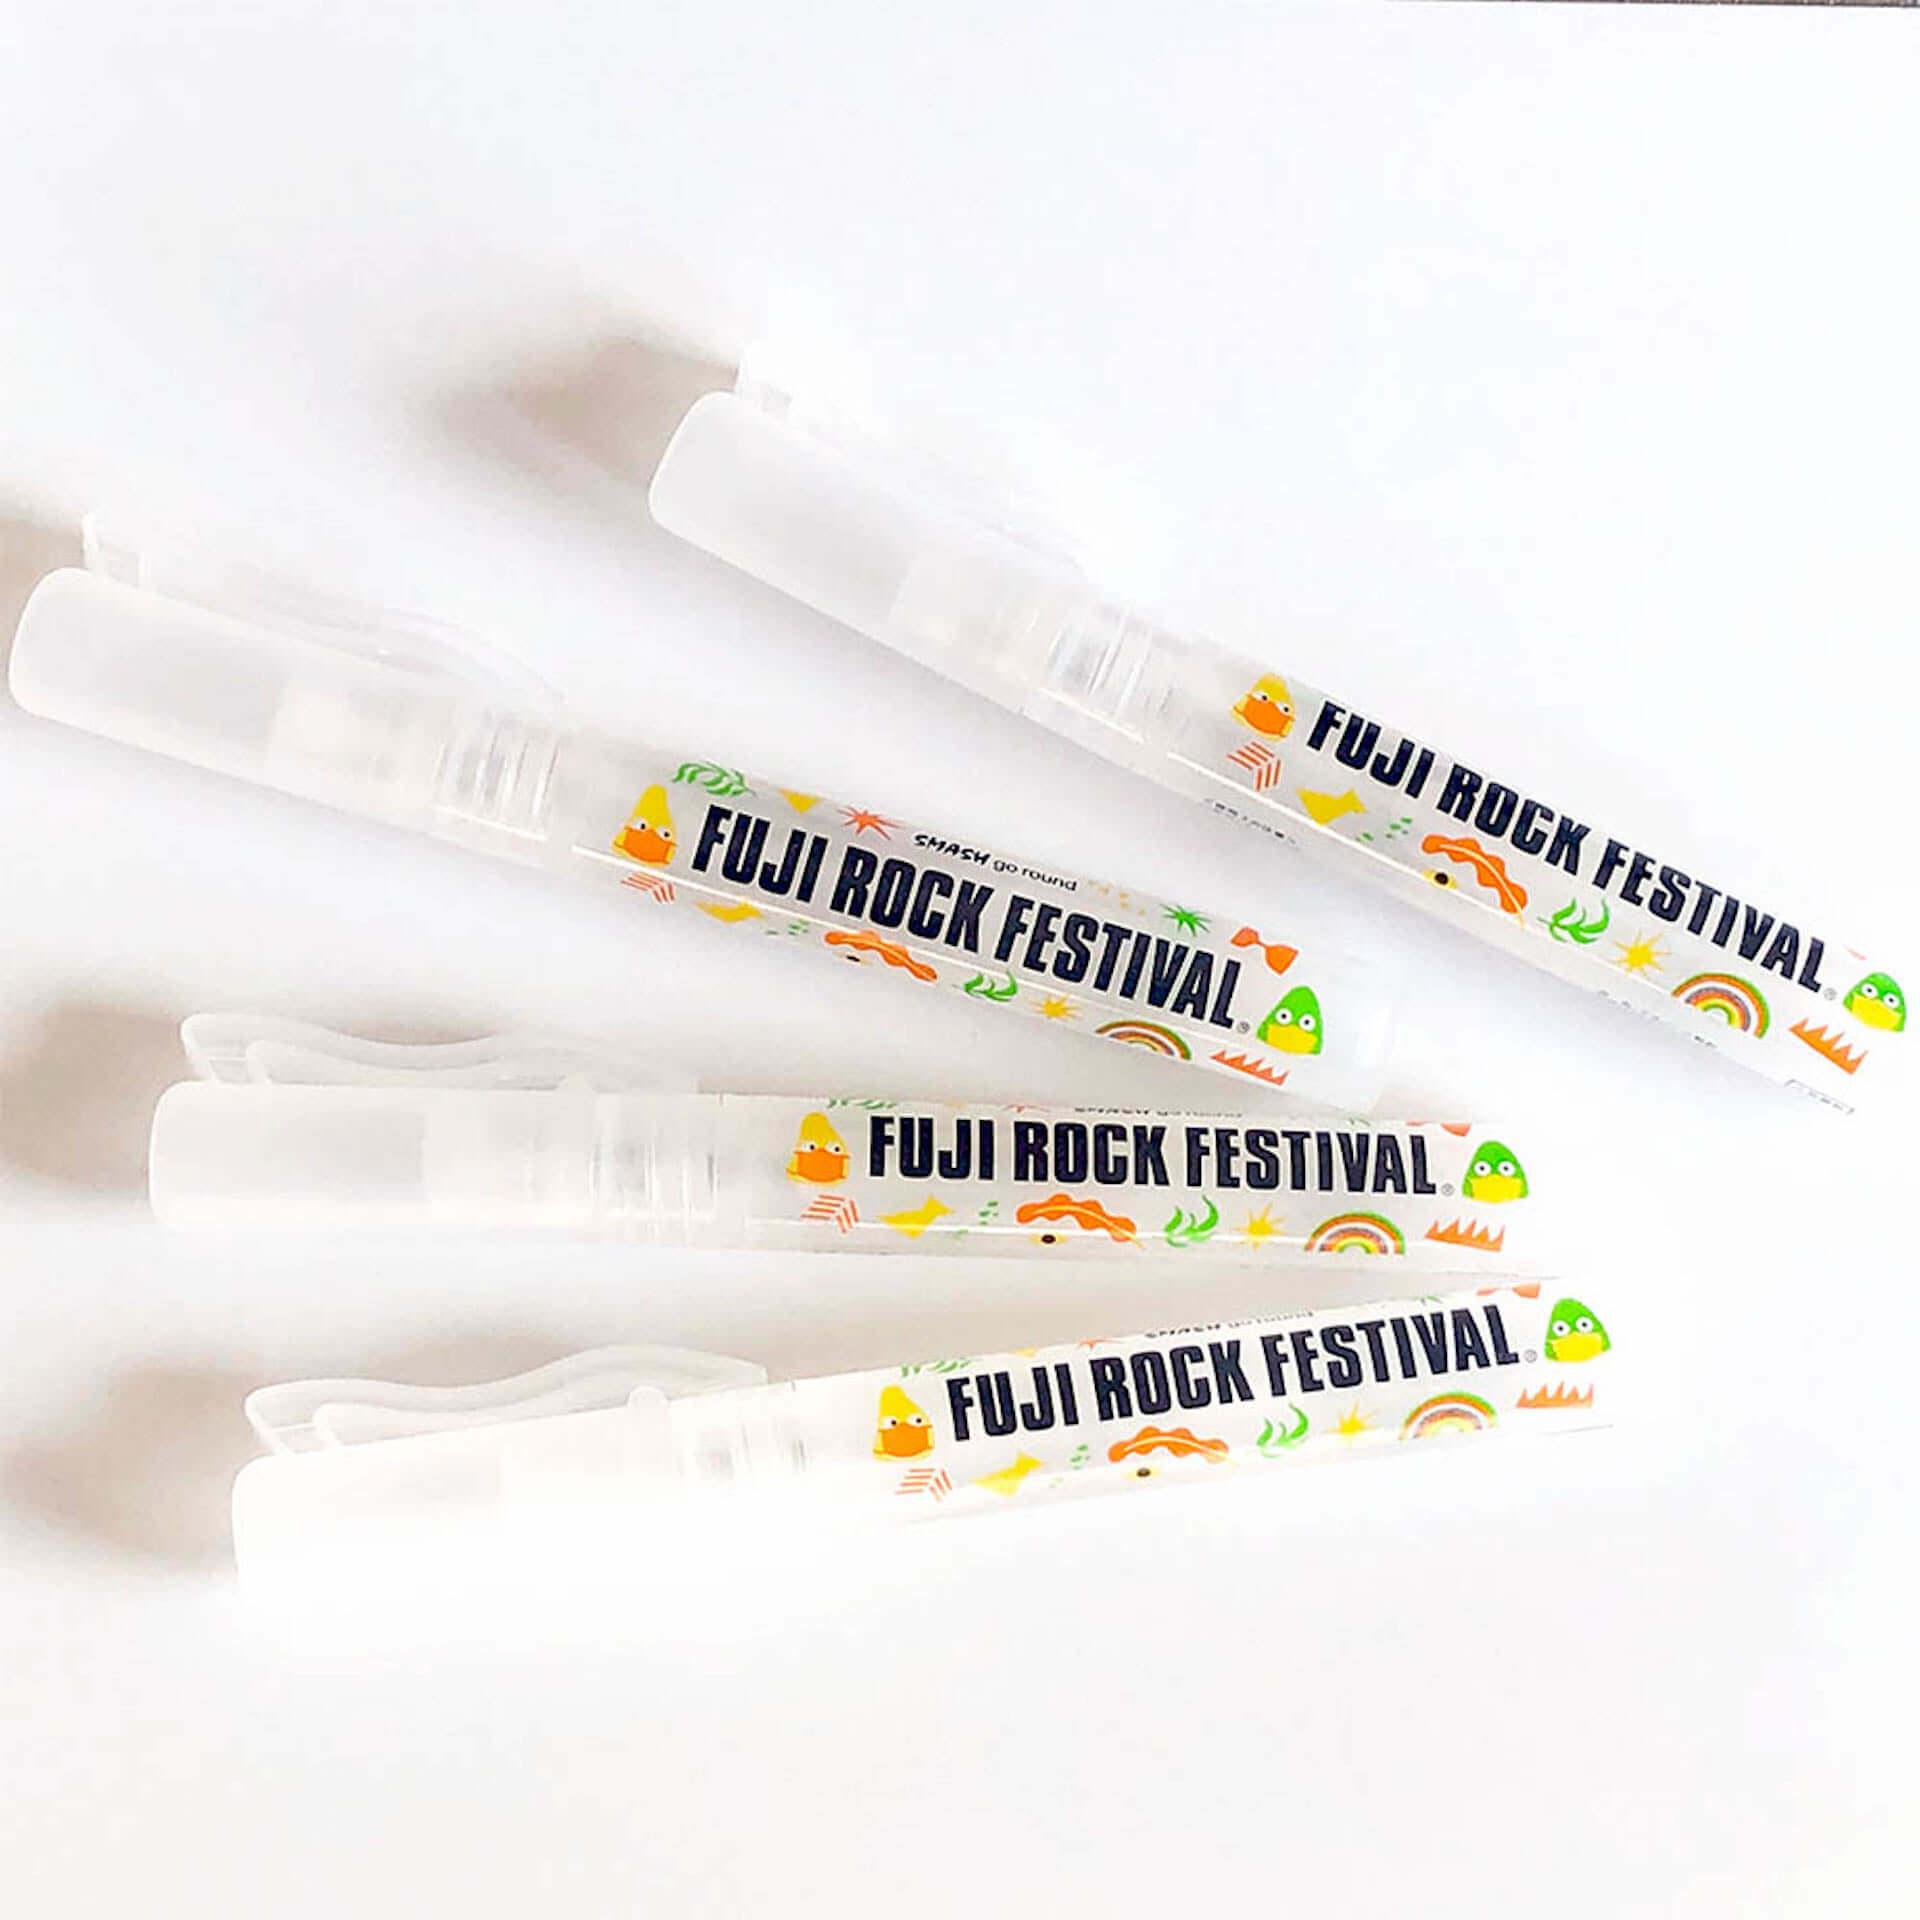 <FUJI ROCK FESTIVAL>公式グッズの新作が登場!大晦日イベント<KEEP ON FUJI ROCKIN' II>のチケットも明日発売 musicf201211_frf_11-1920x1920